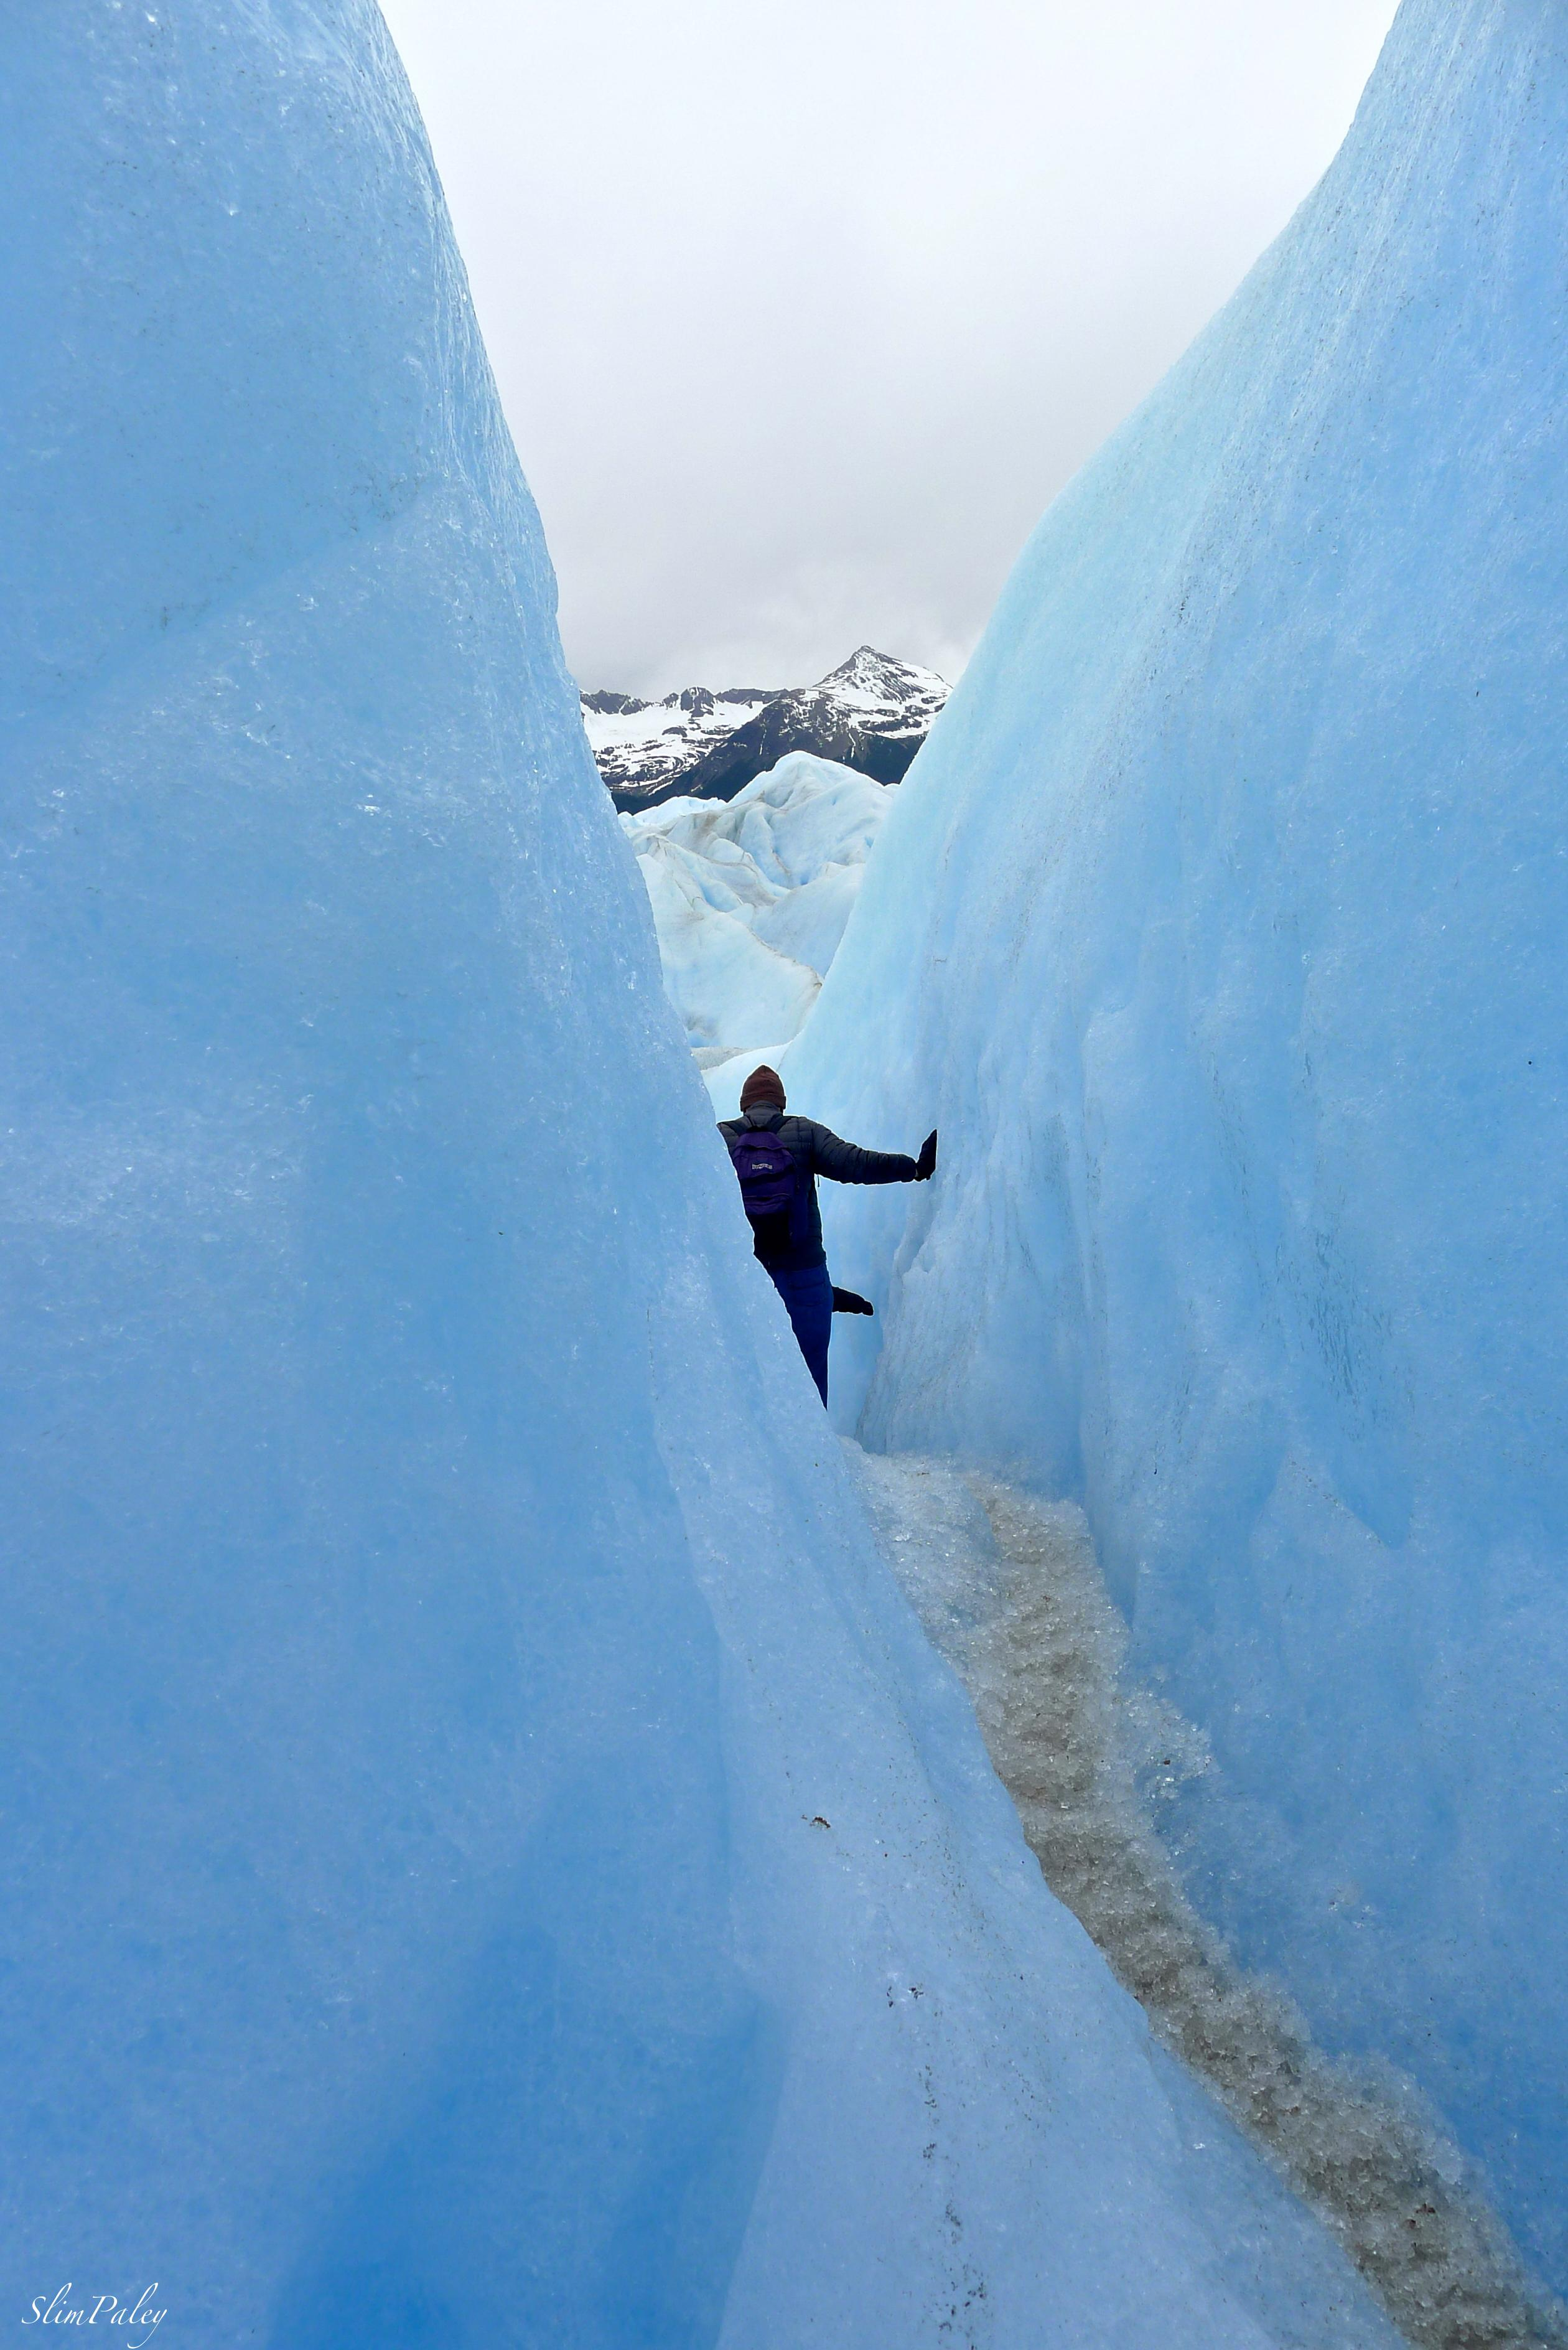 glacier crevasse, slimpaley.com